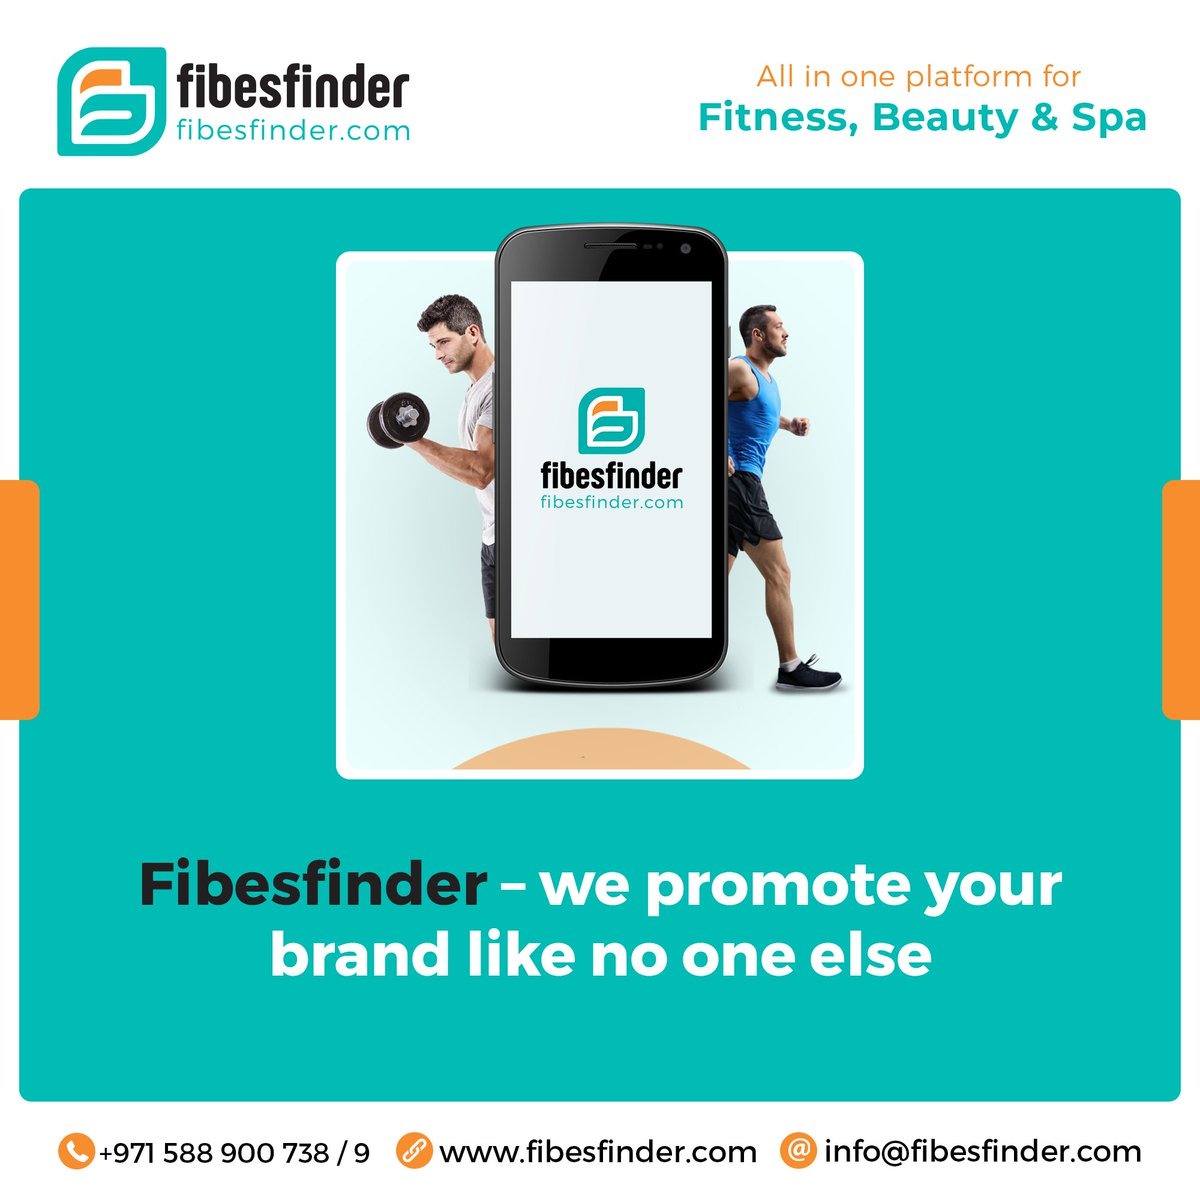 Fibesfinder – We Promote your Brand like no one else.  #fitness #gym #workout #fitnessmotivation #fibesfinder #dubai #fitness #beauty #spa #advertisement